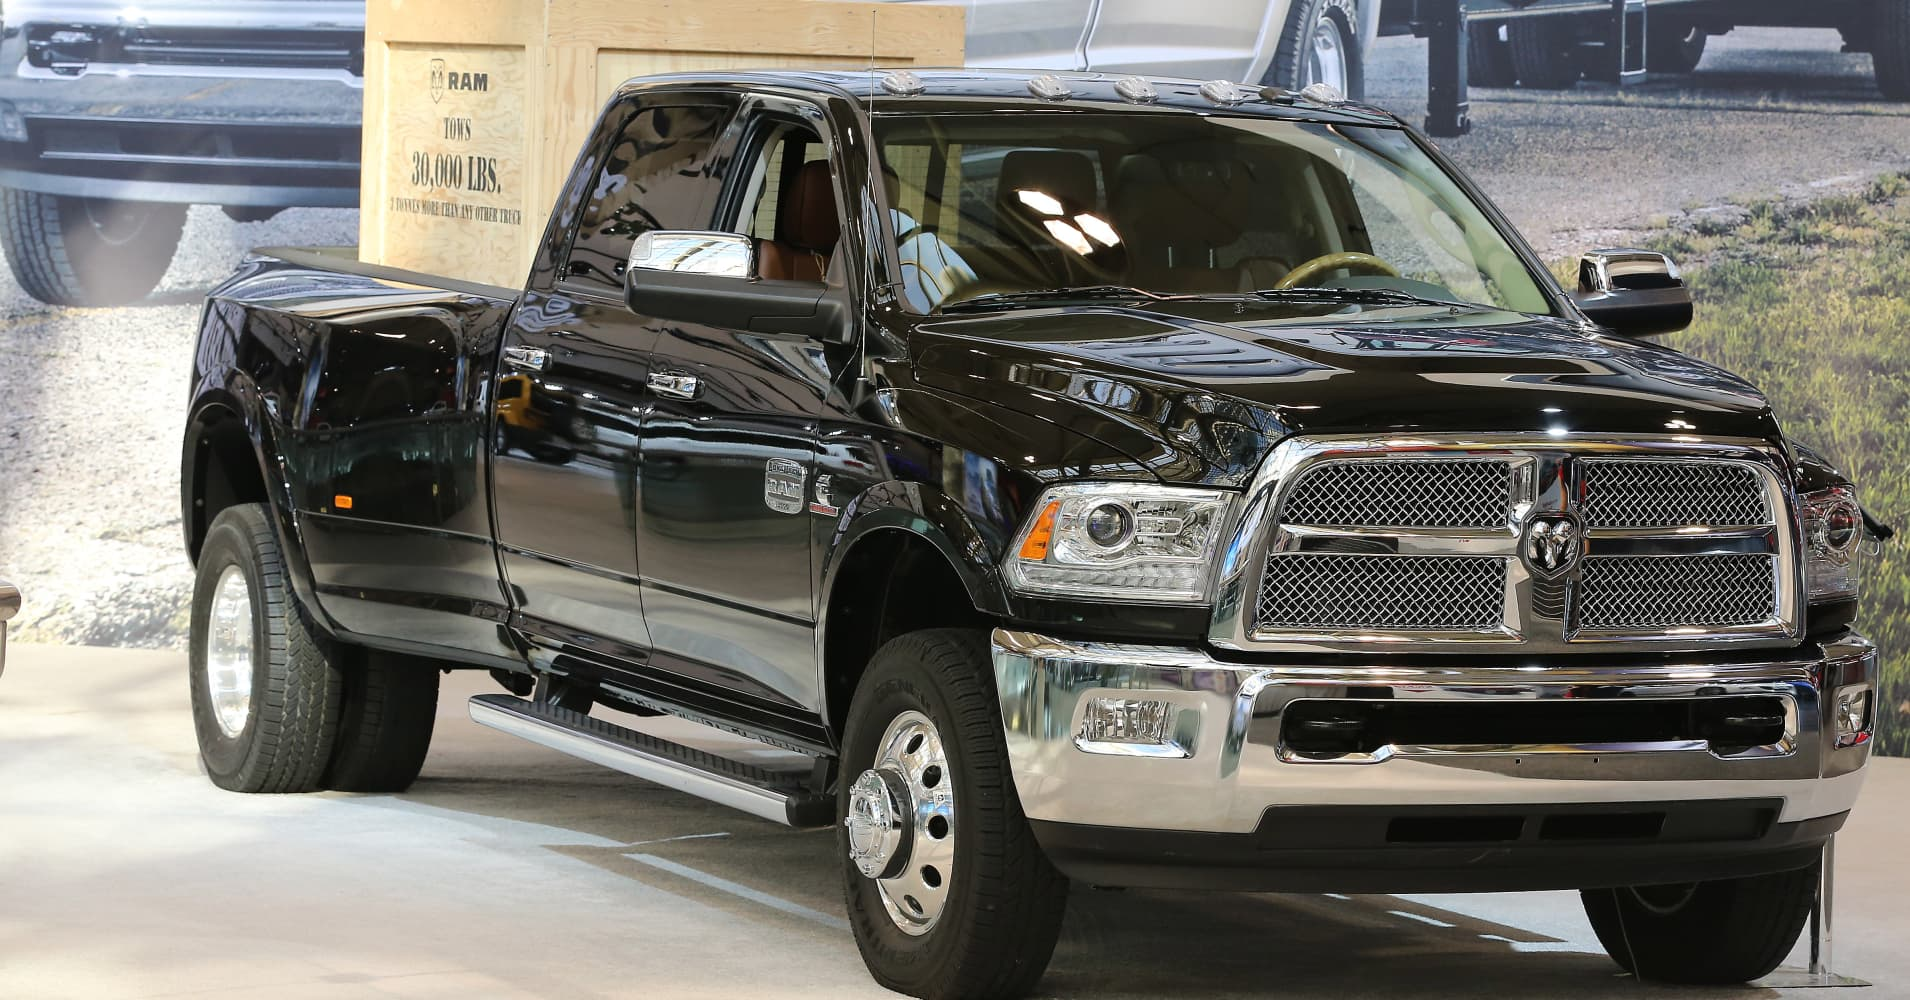 fiat chrysler recalling nearly 500 000 ram pickup trucks. Black Bedroom Furniture Sets. Home Design Ideas